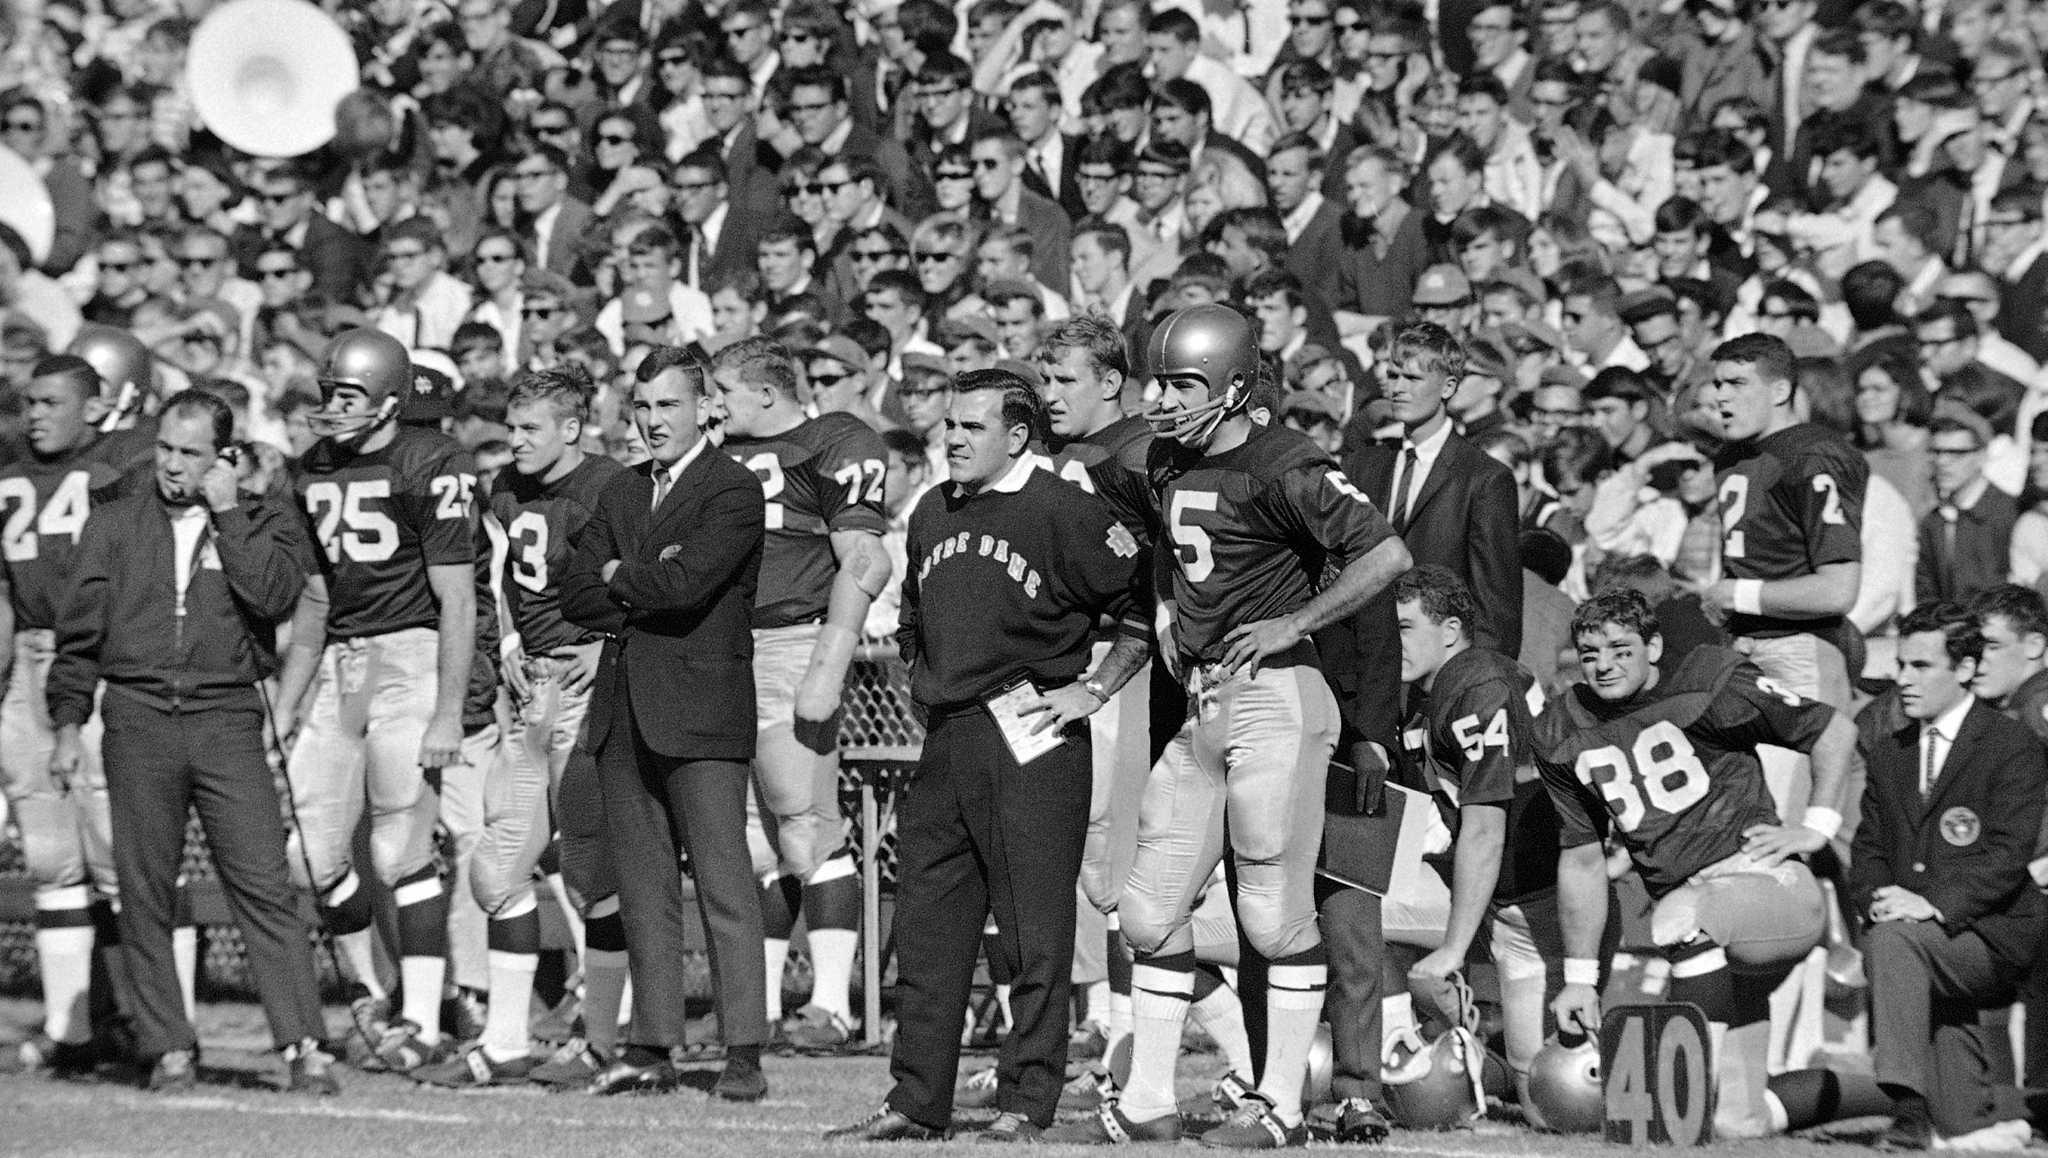 Former Nd Quarterback Hanratty Remembers Parseghian